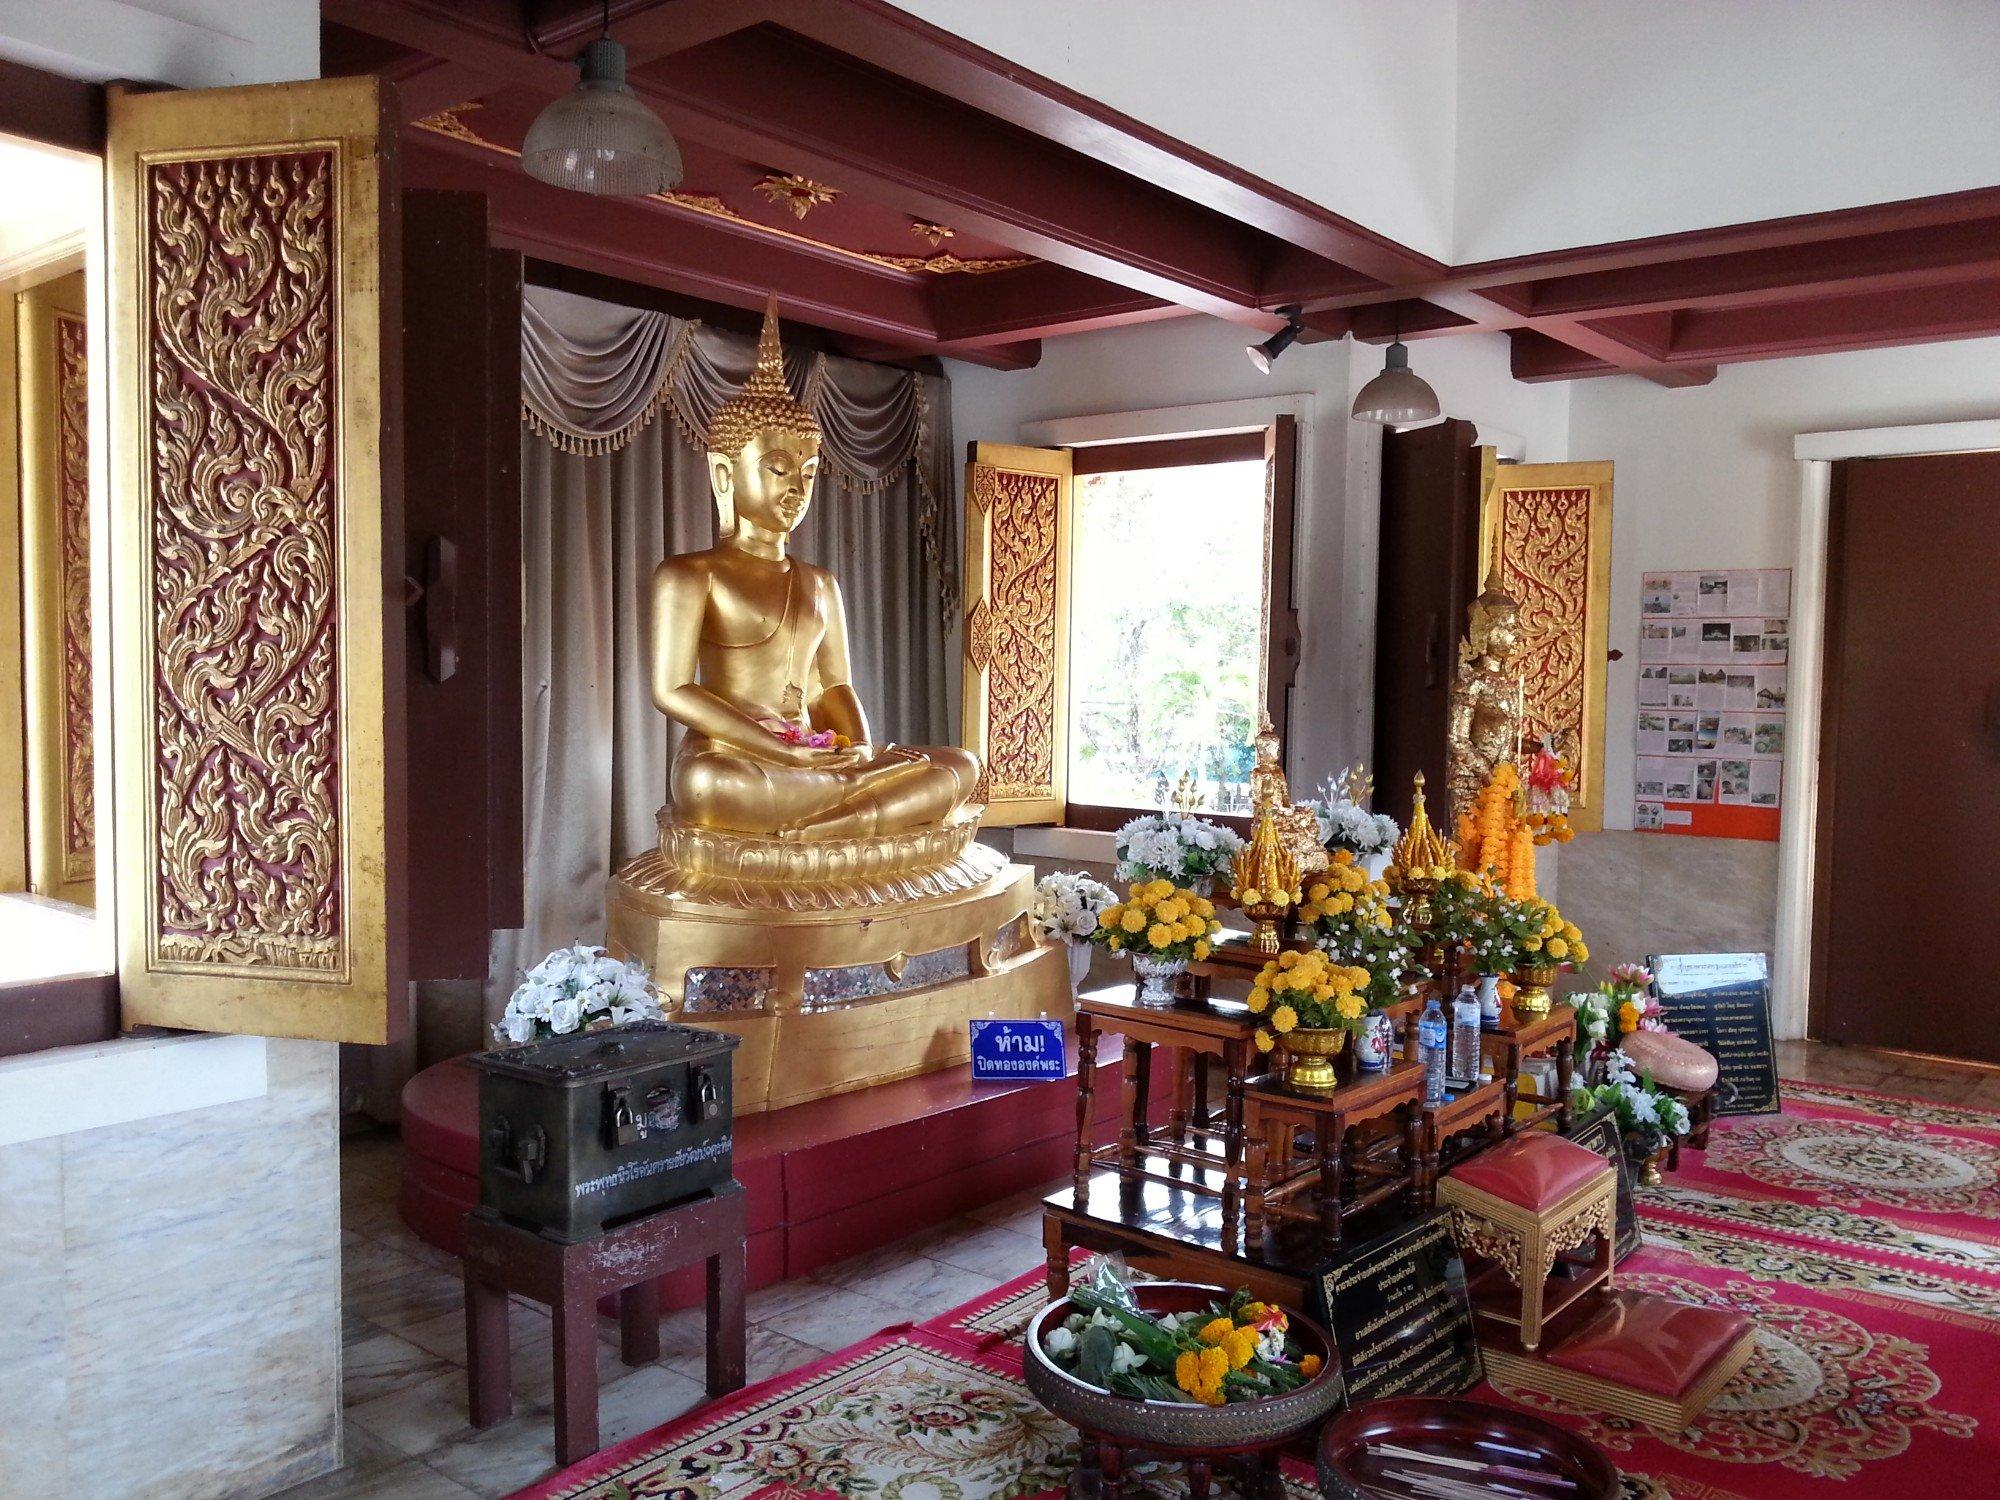 Phra Phuttha Nirokhantrai Chaiwat Chaturathit in Phatthalung